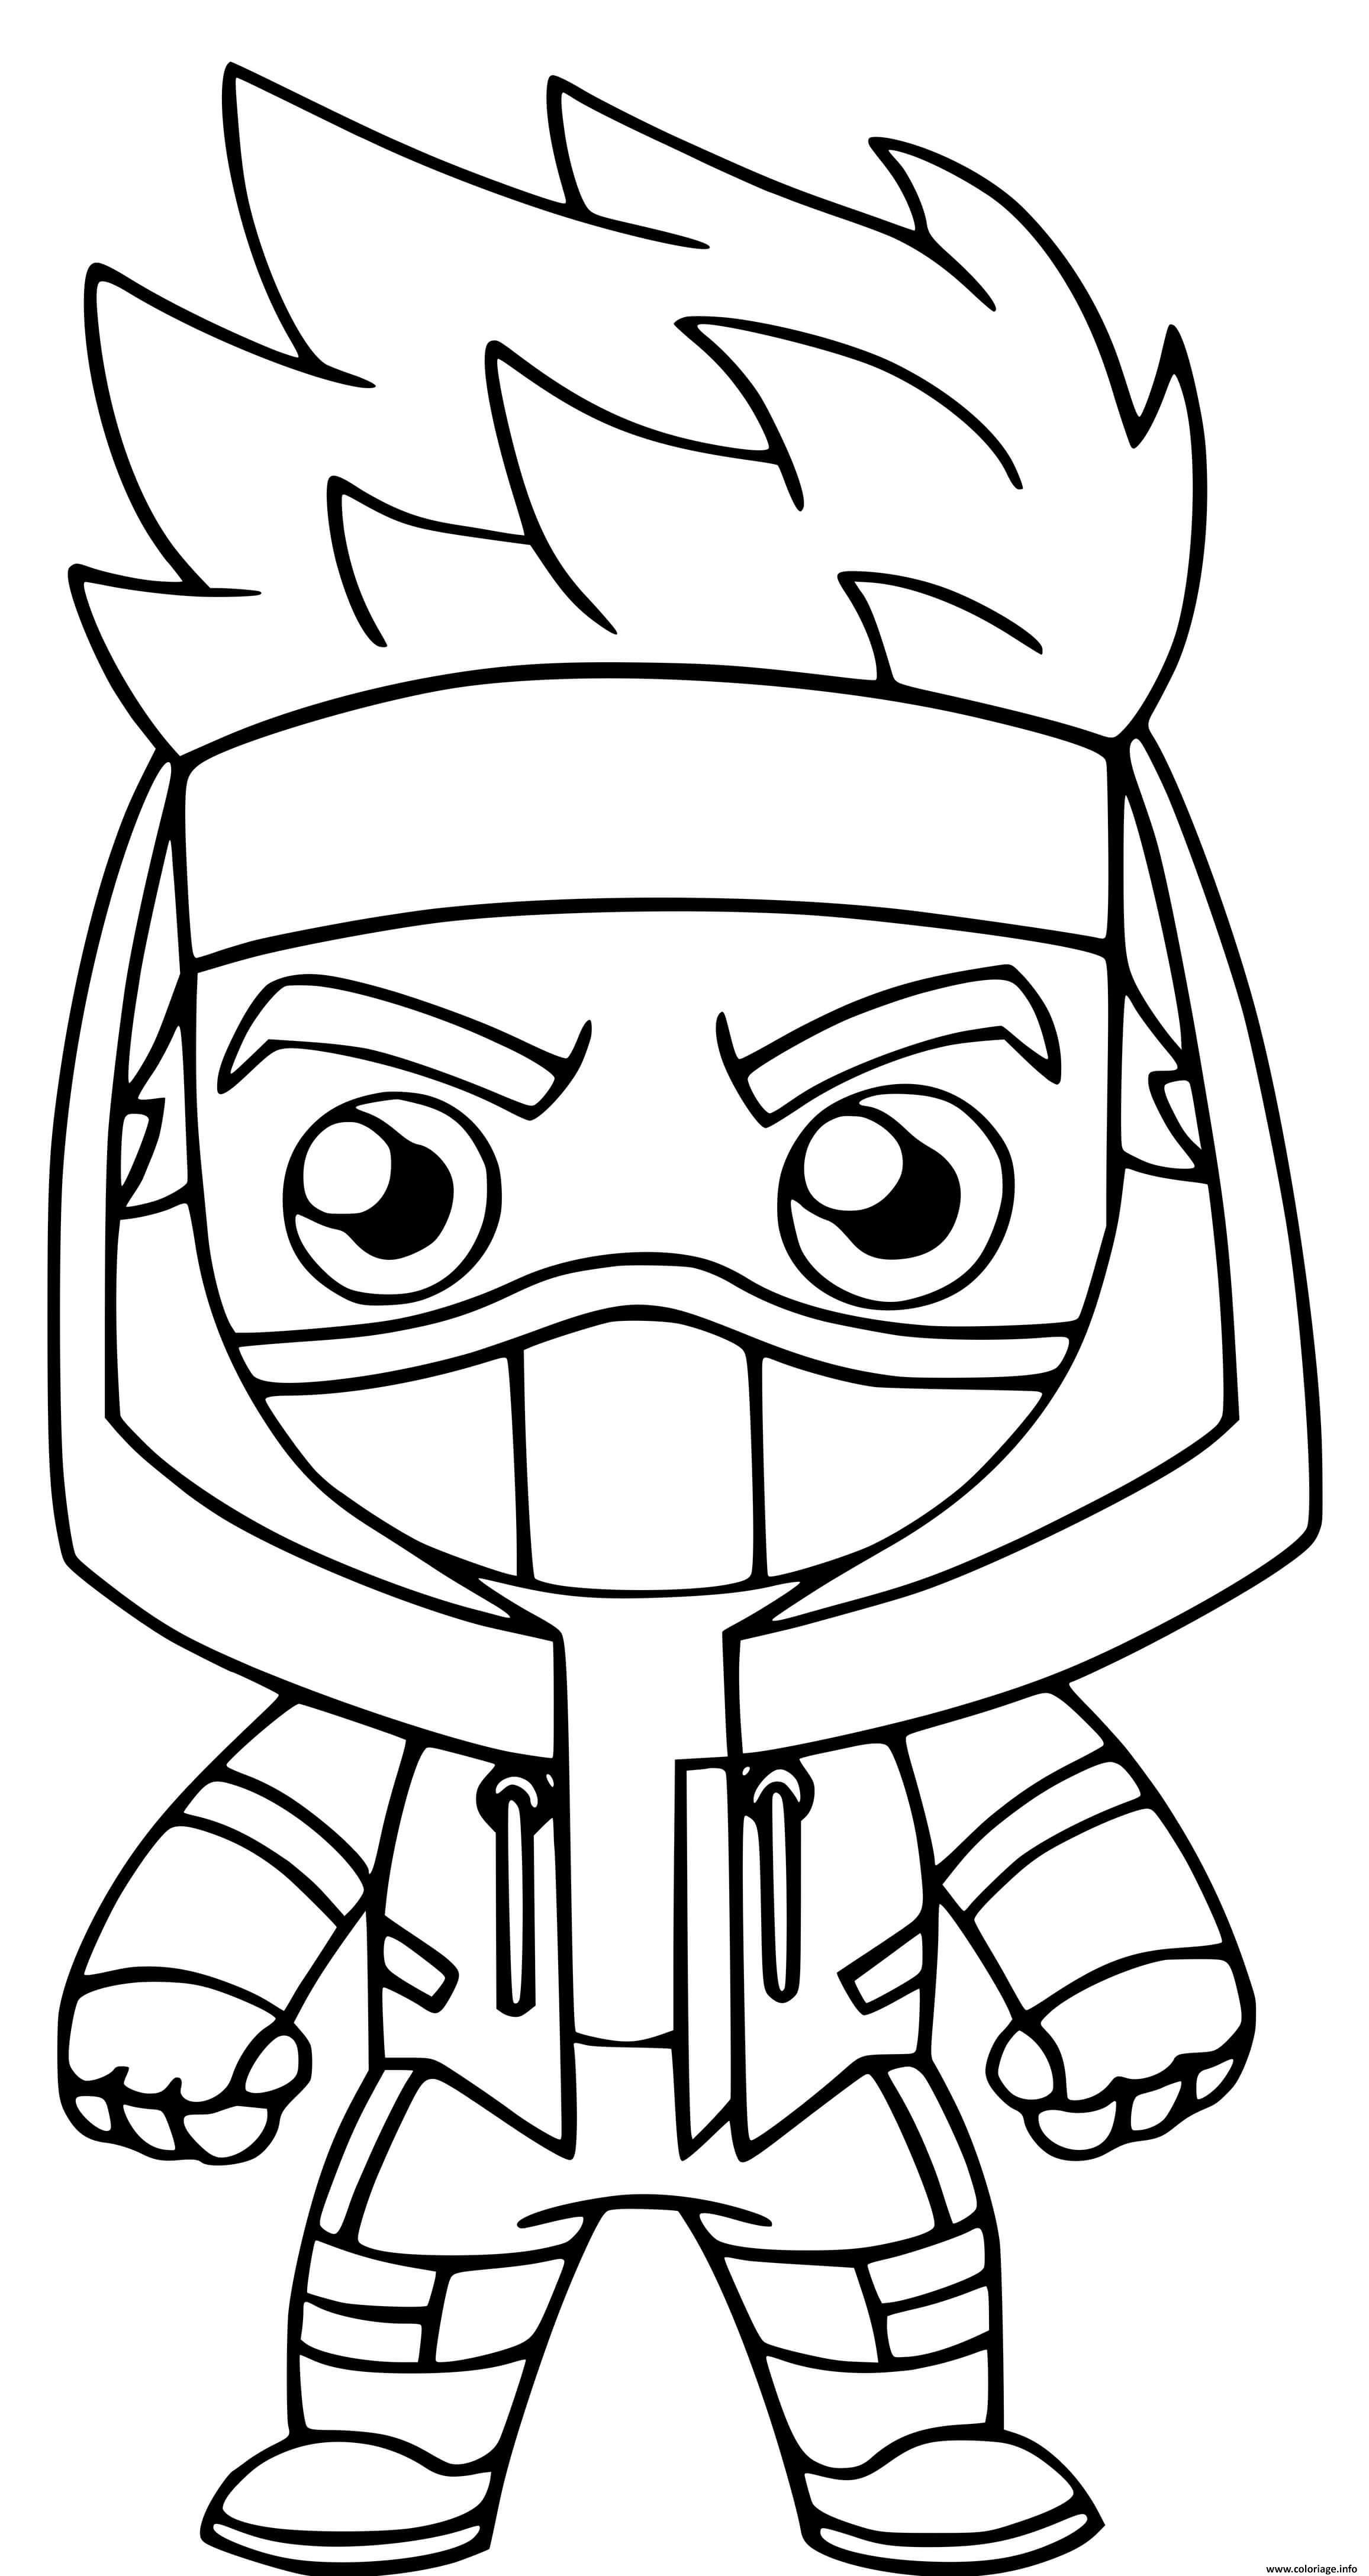 Dessin ninja fortnite fort Coloriage Gratuit à Imprimer